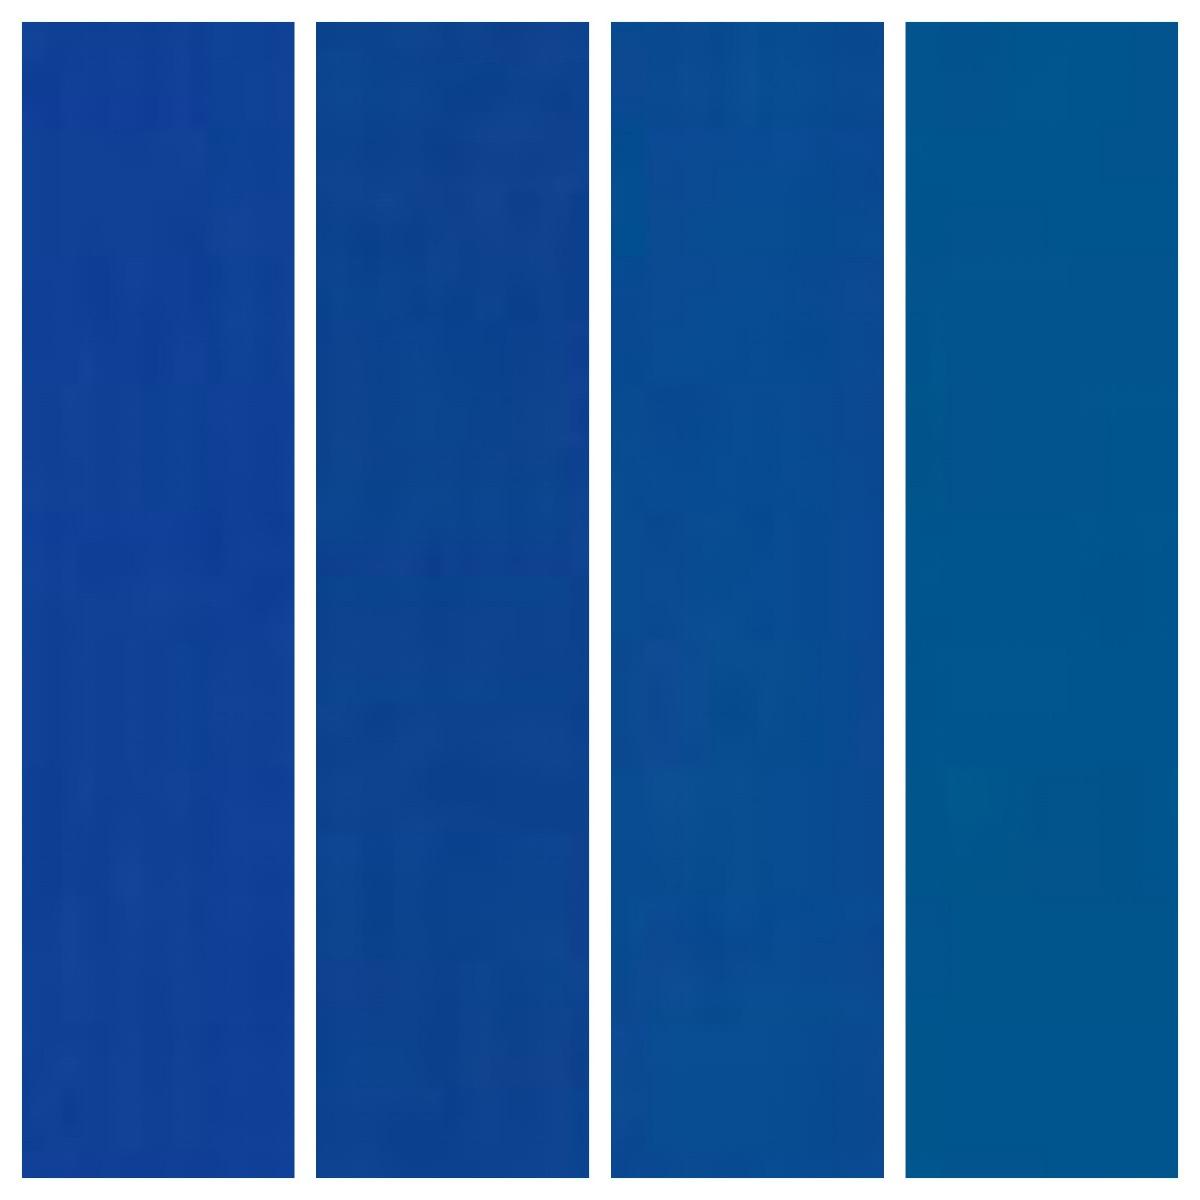 Big Chill custom colors: 5005 Signal Blue, 5010 Gentian Blue, 5017 Traffic Blue, 5019 Capri Blue